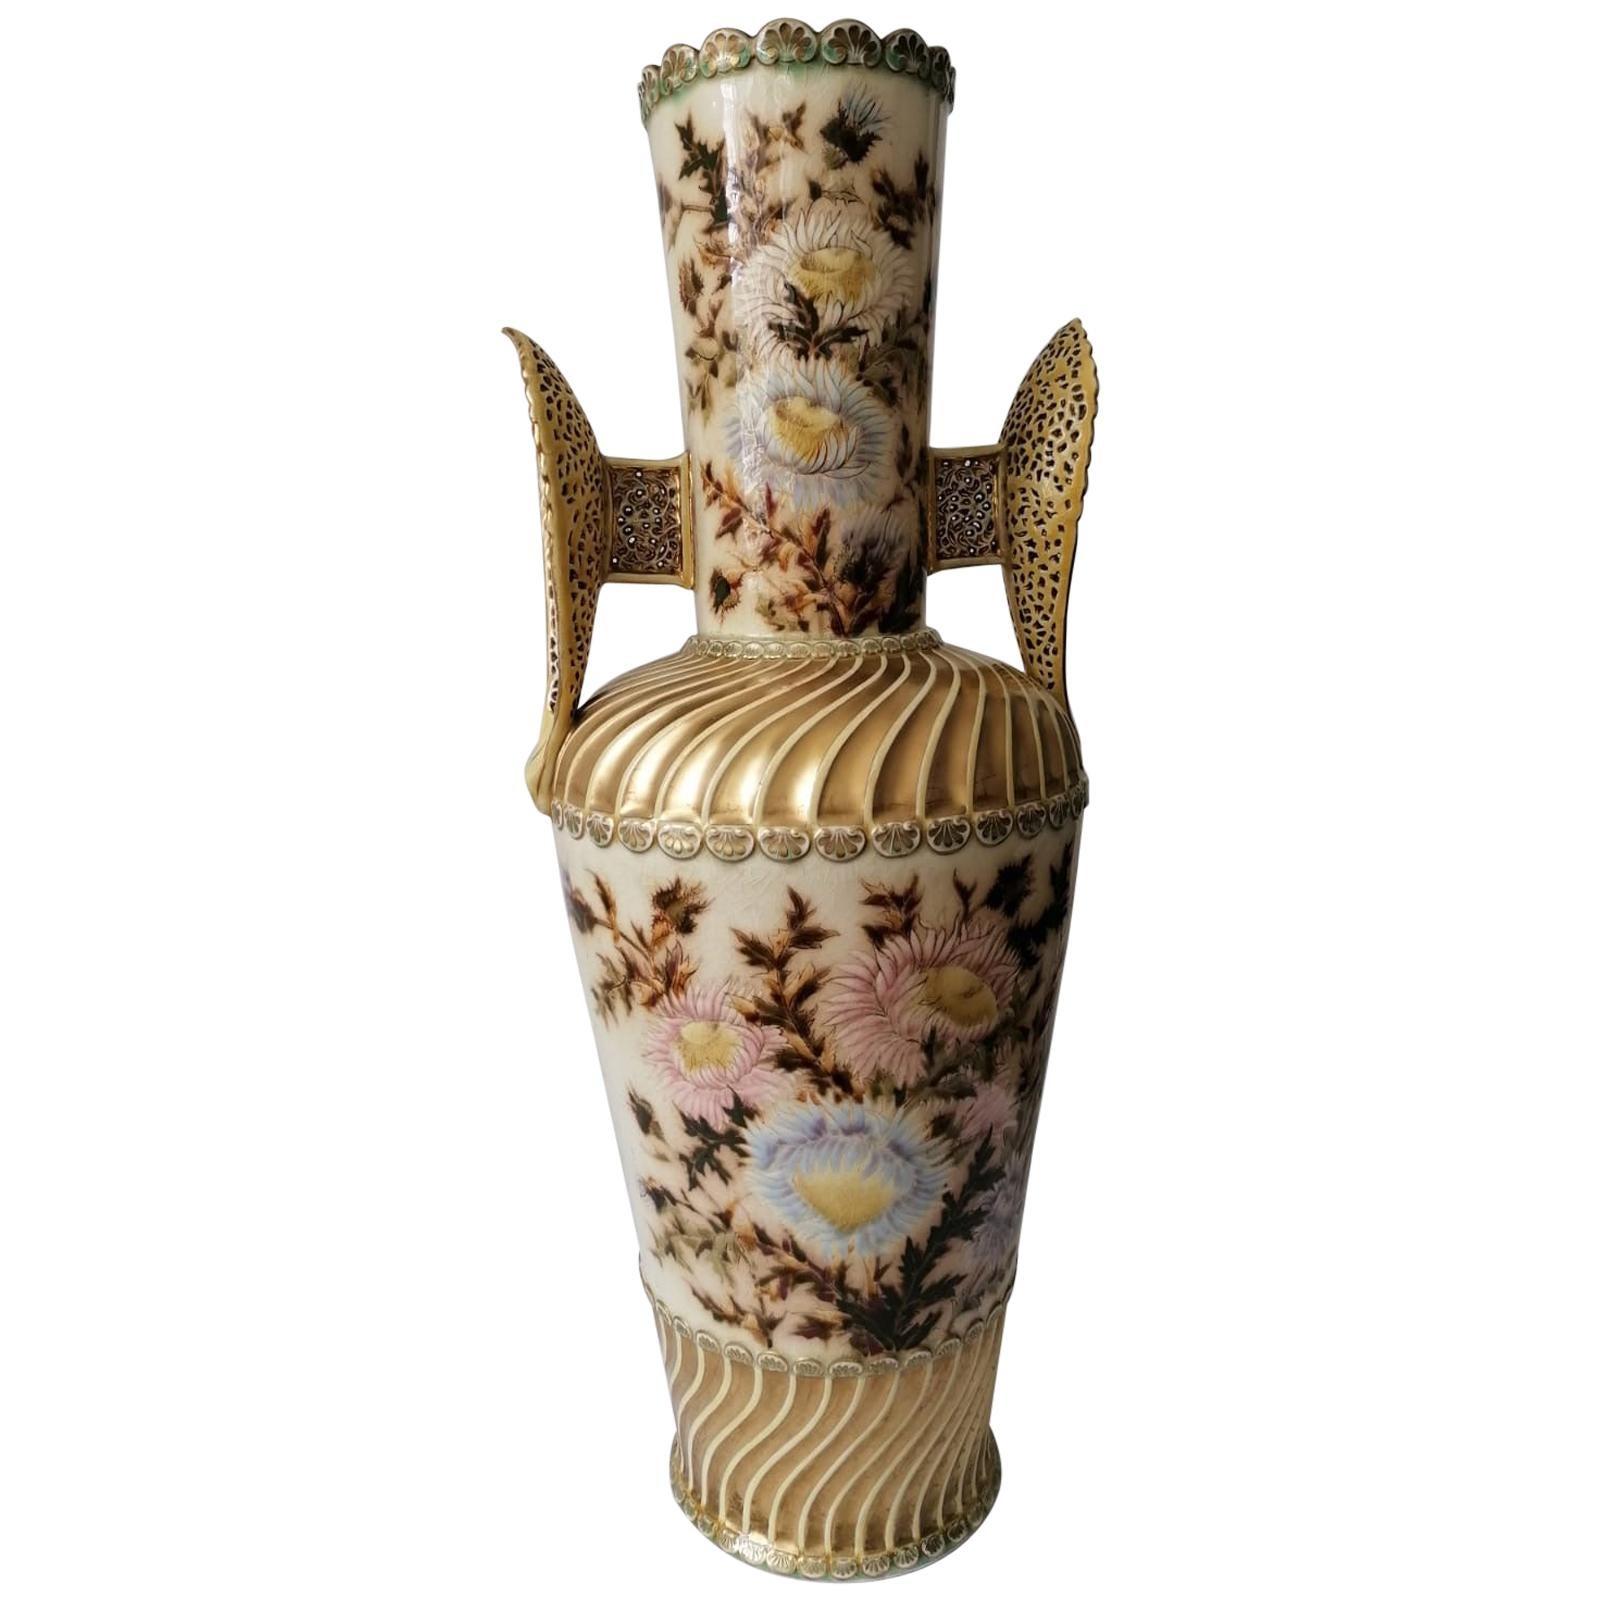 Large Vase by Zsolnay